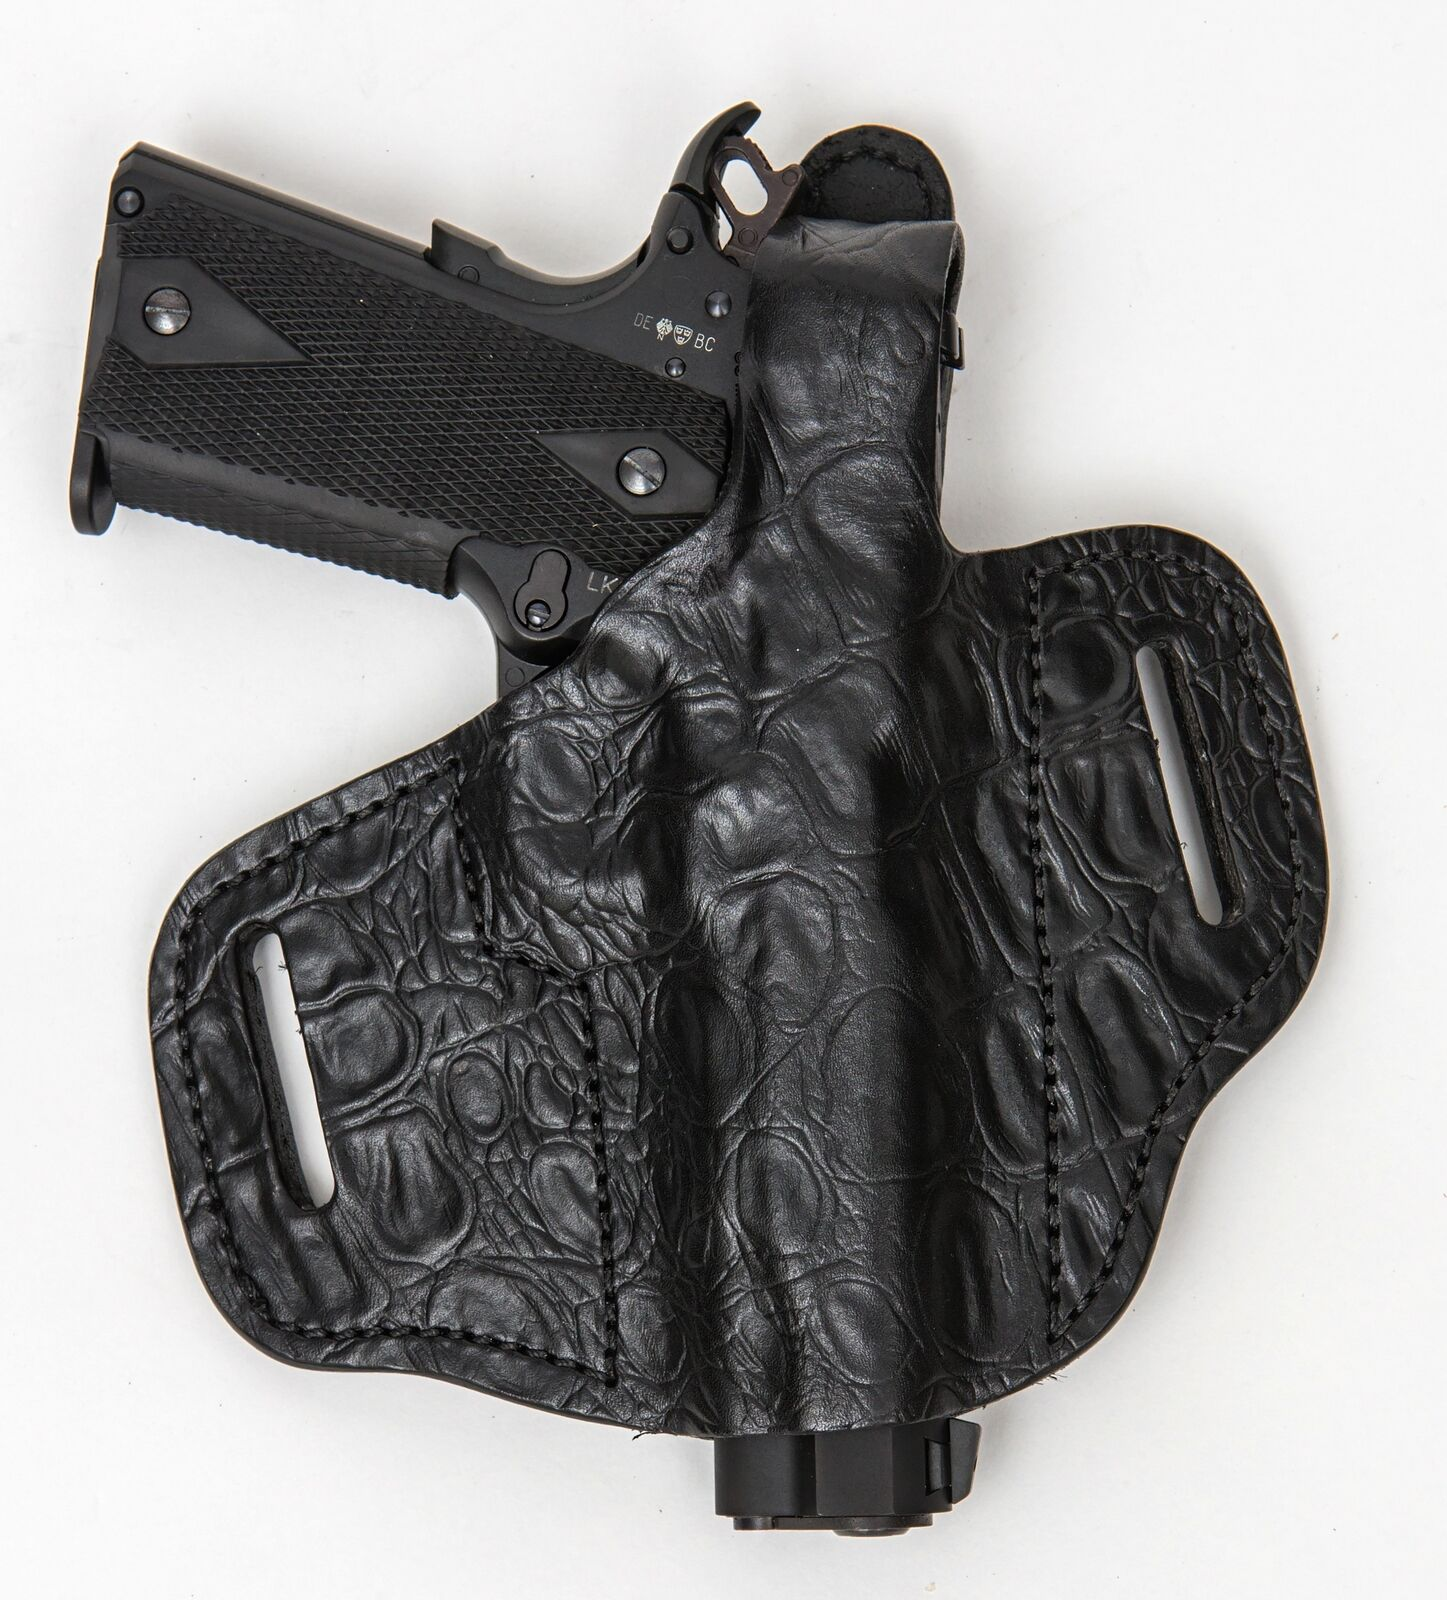 On Duty Conceal RH LH OWB Leder Gun Holster For Remington 1911 5